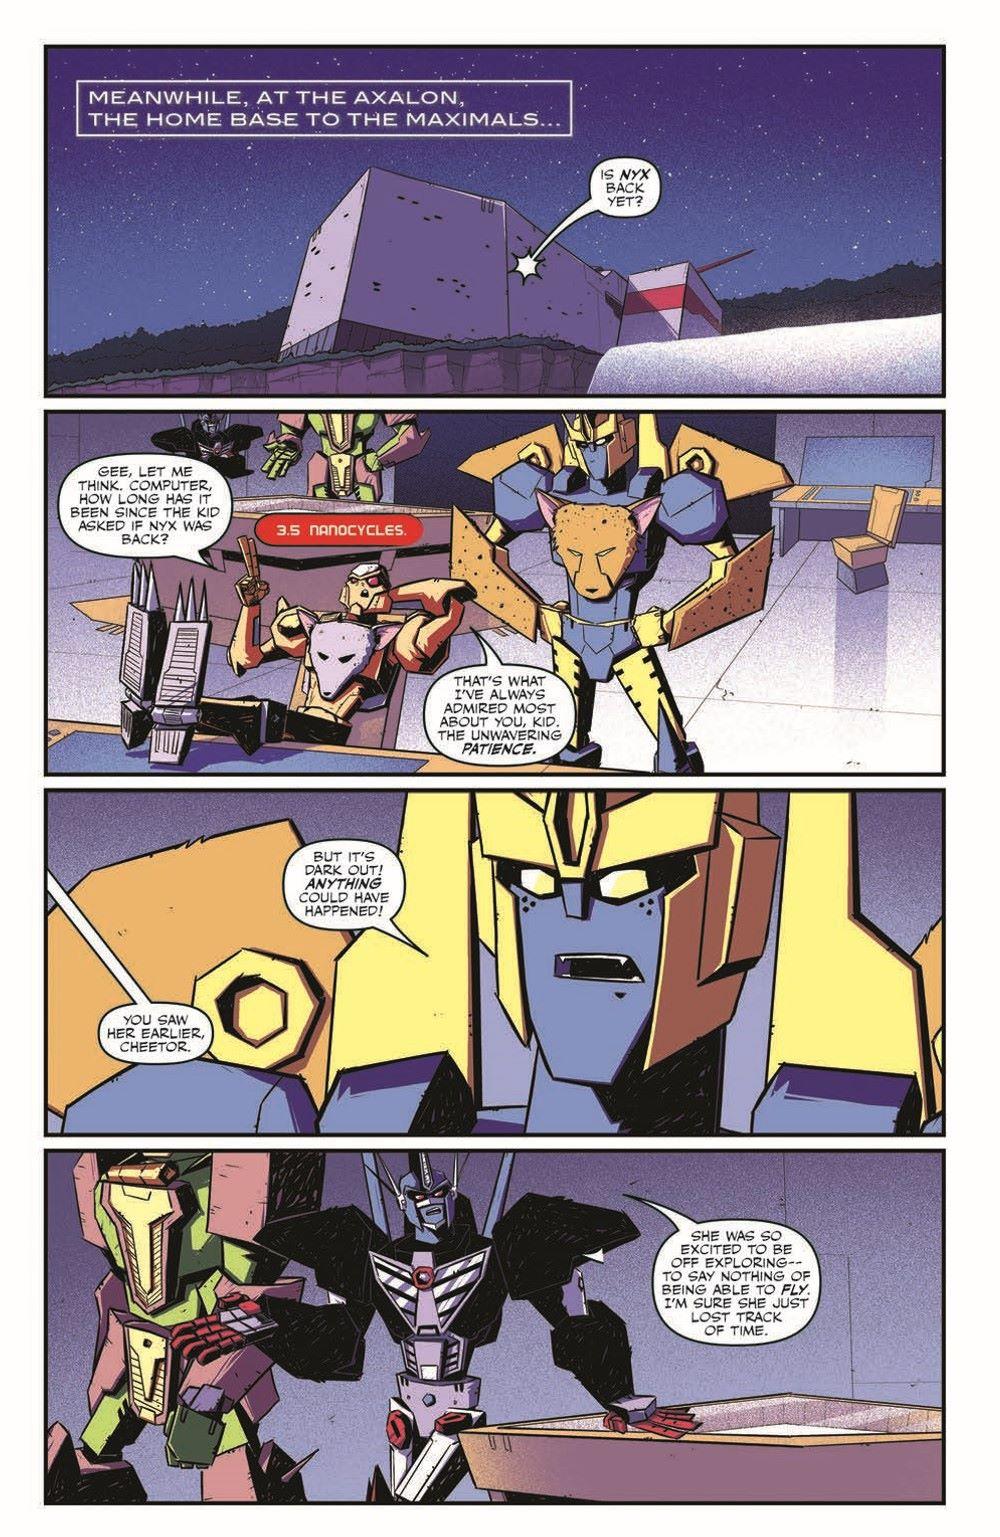 TFBW_03_pr-6 ComicList Previews: TRANSFORMERS BEAST WARS #3